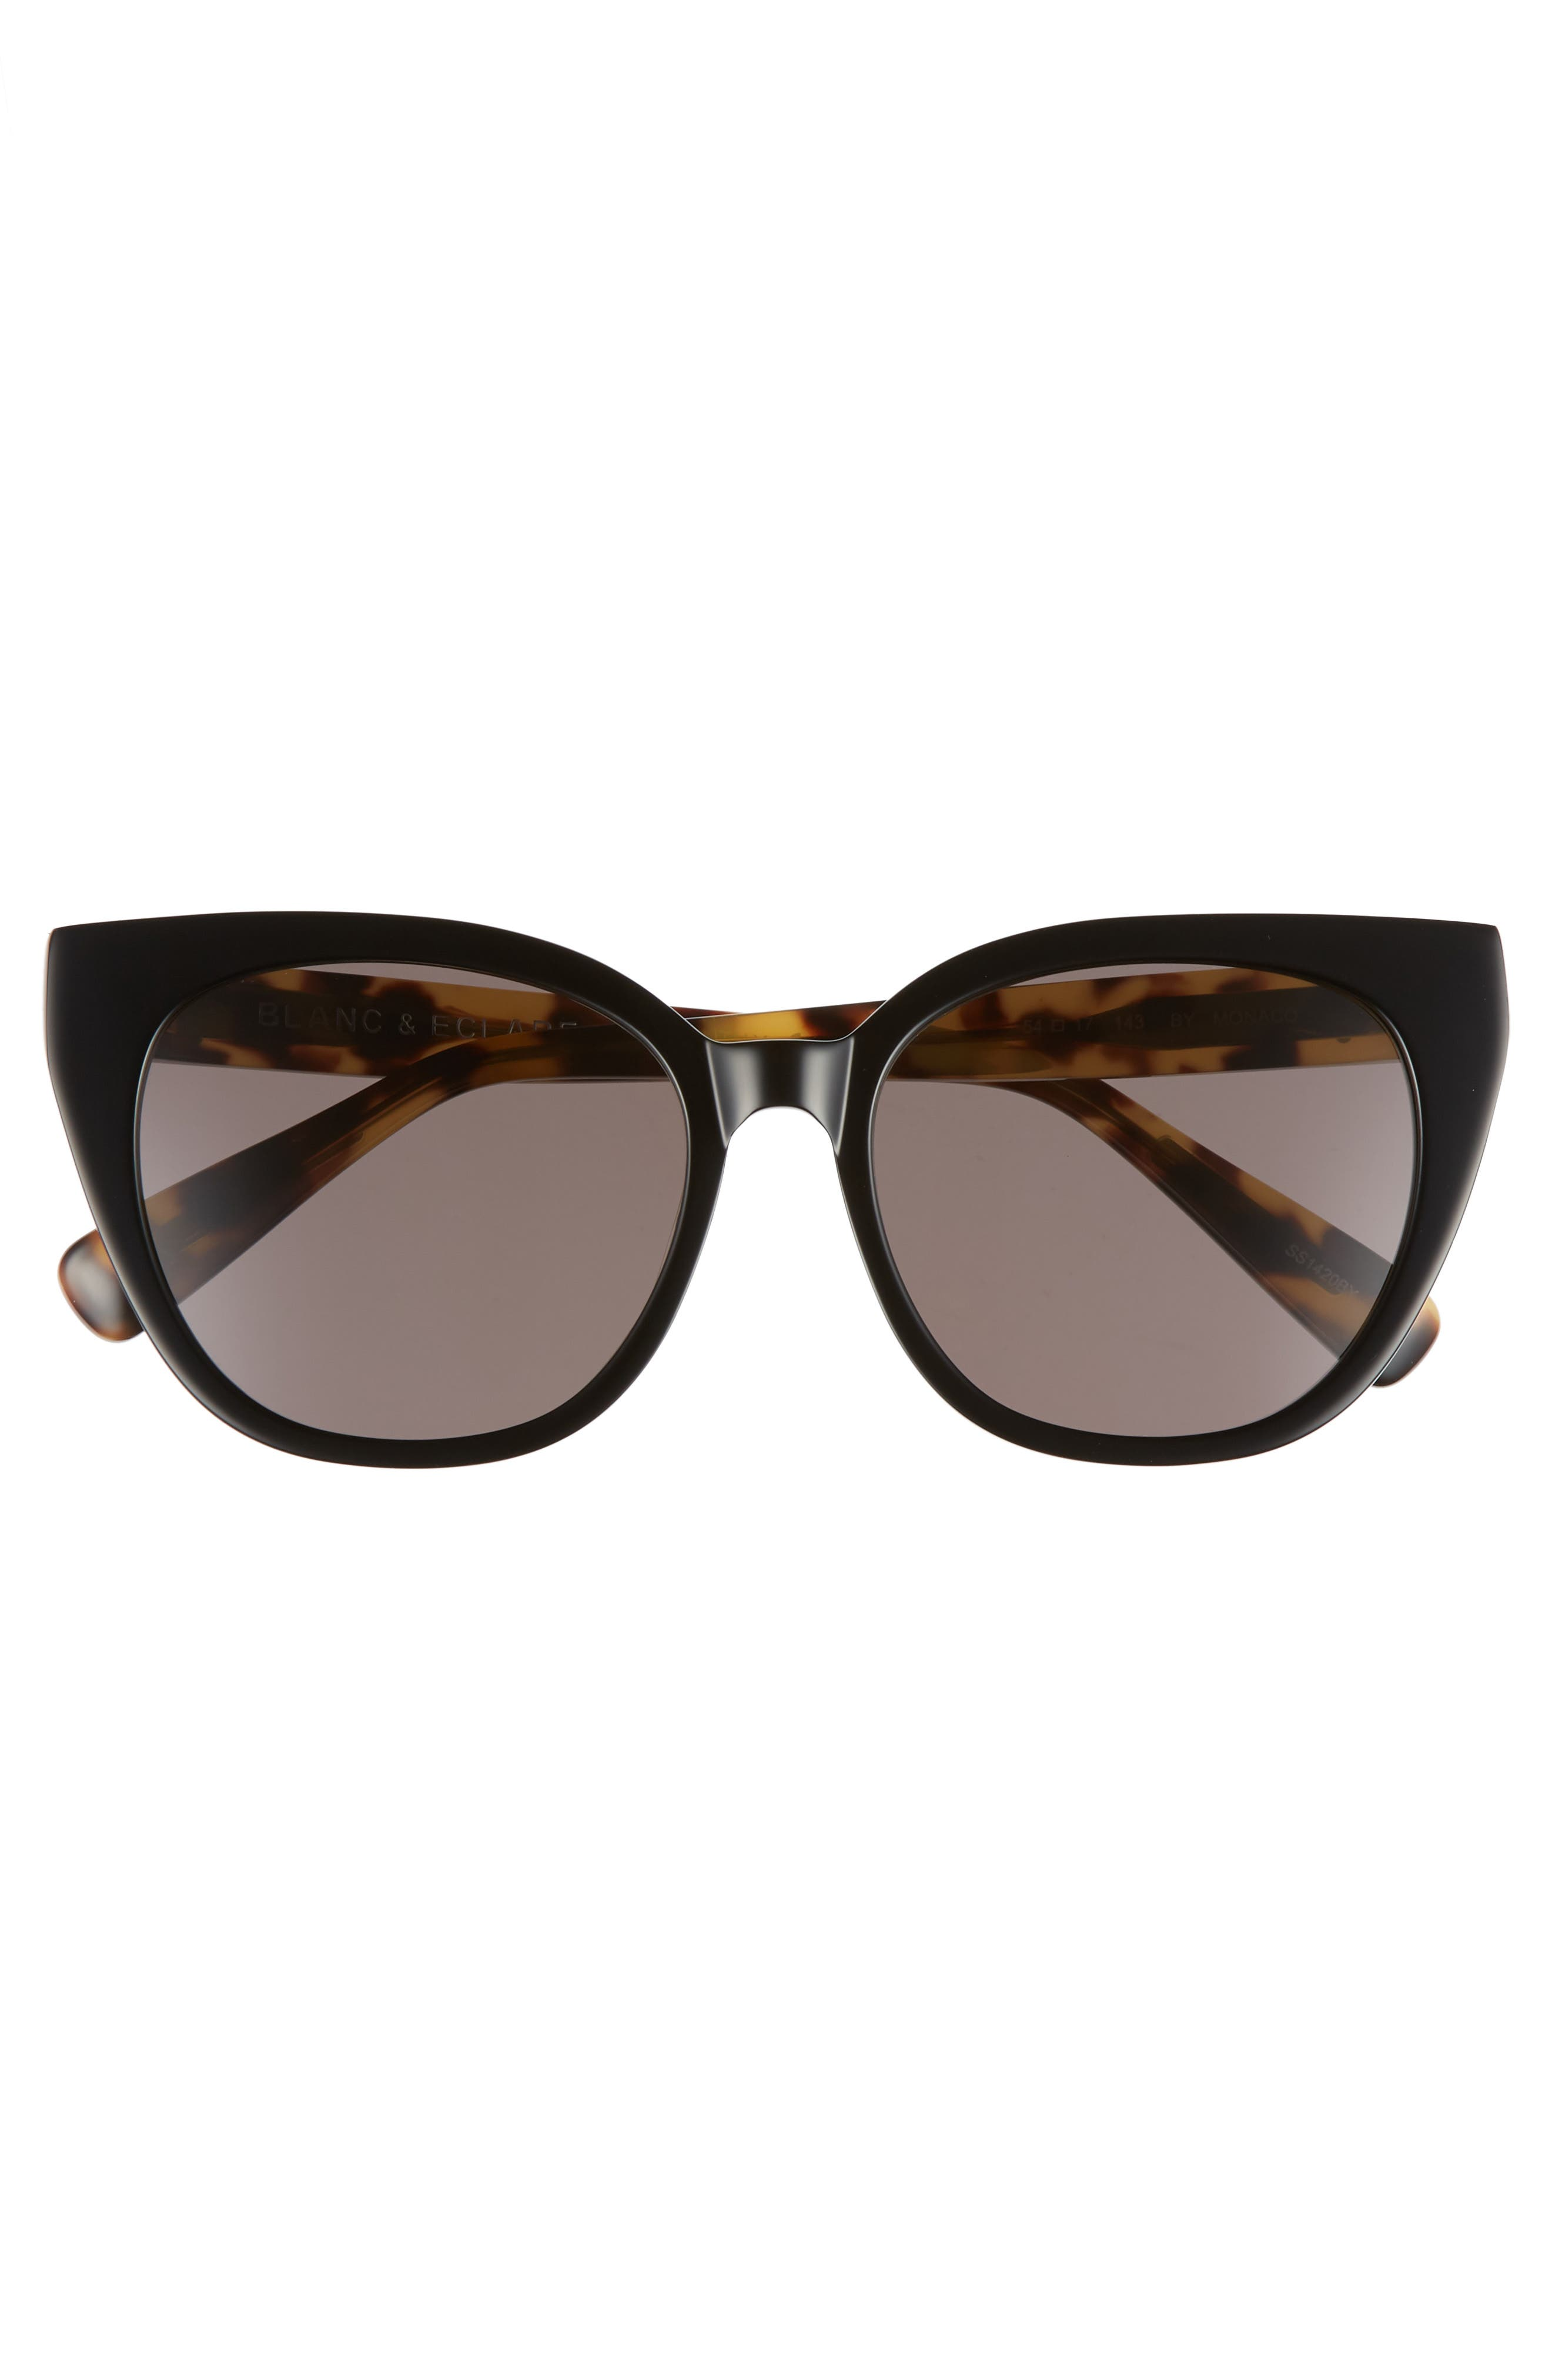 BLANC & ECLARE Monaco 54mm Cat Eye Sunglasses,                             Alternate thumbnail 3, color,                             Black/ Lemon Tortoise/ Grey